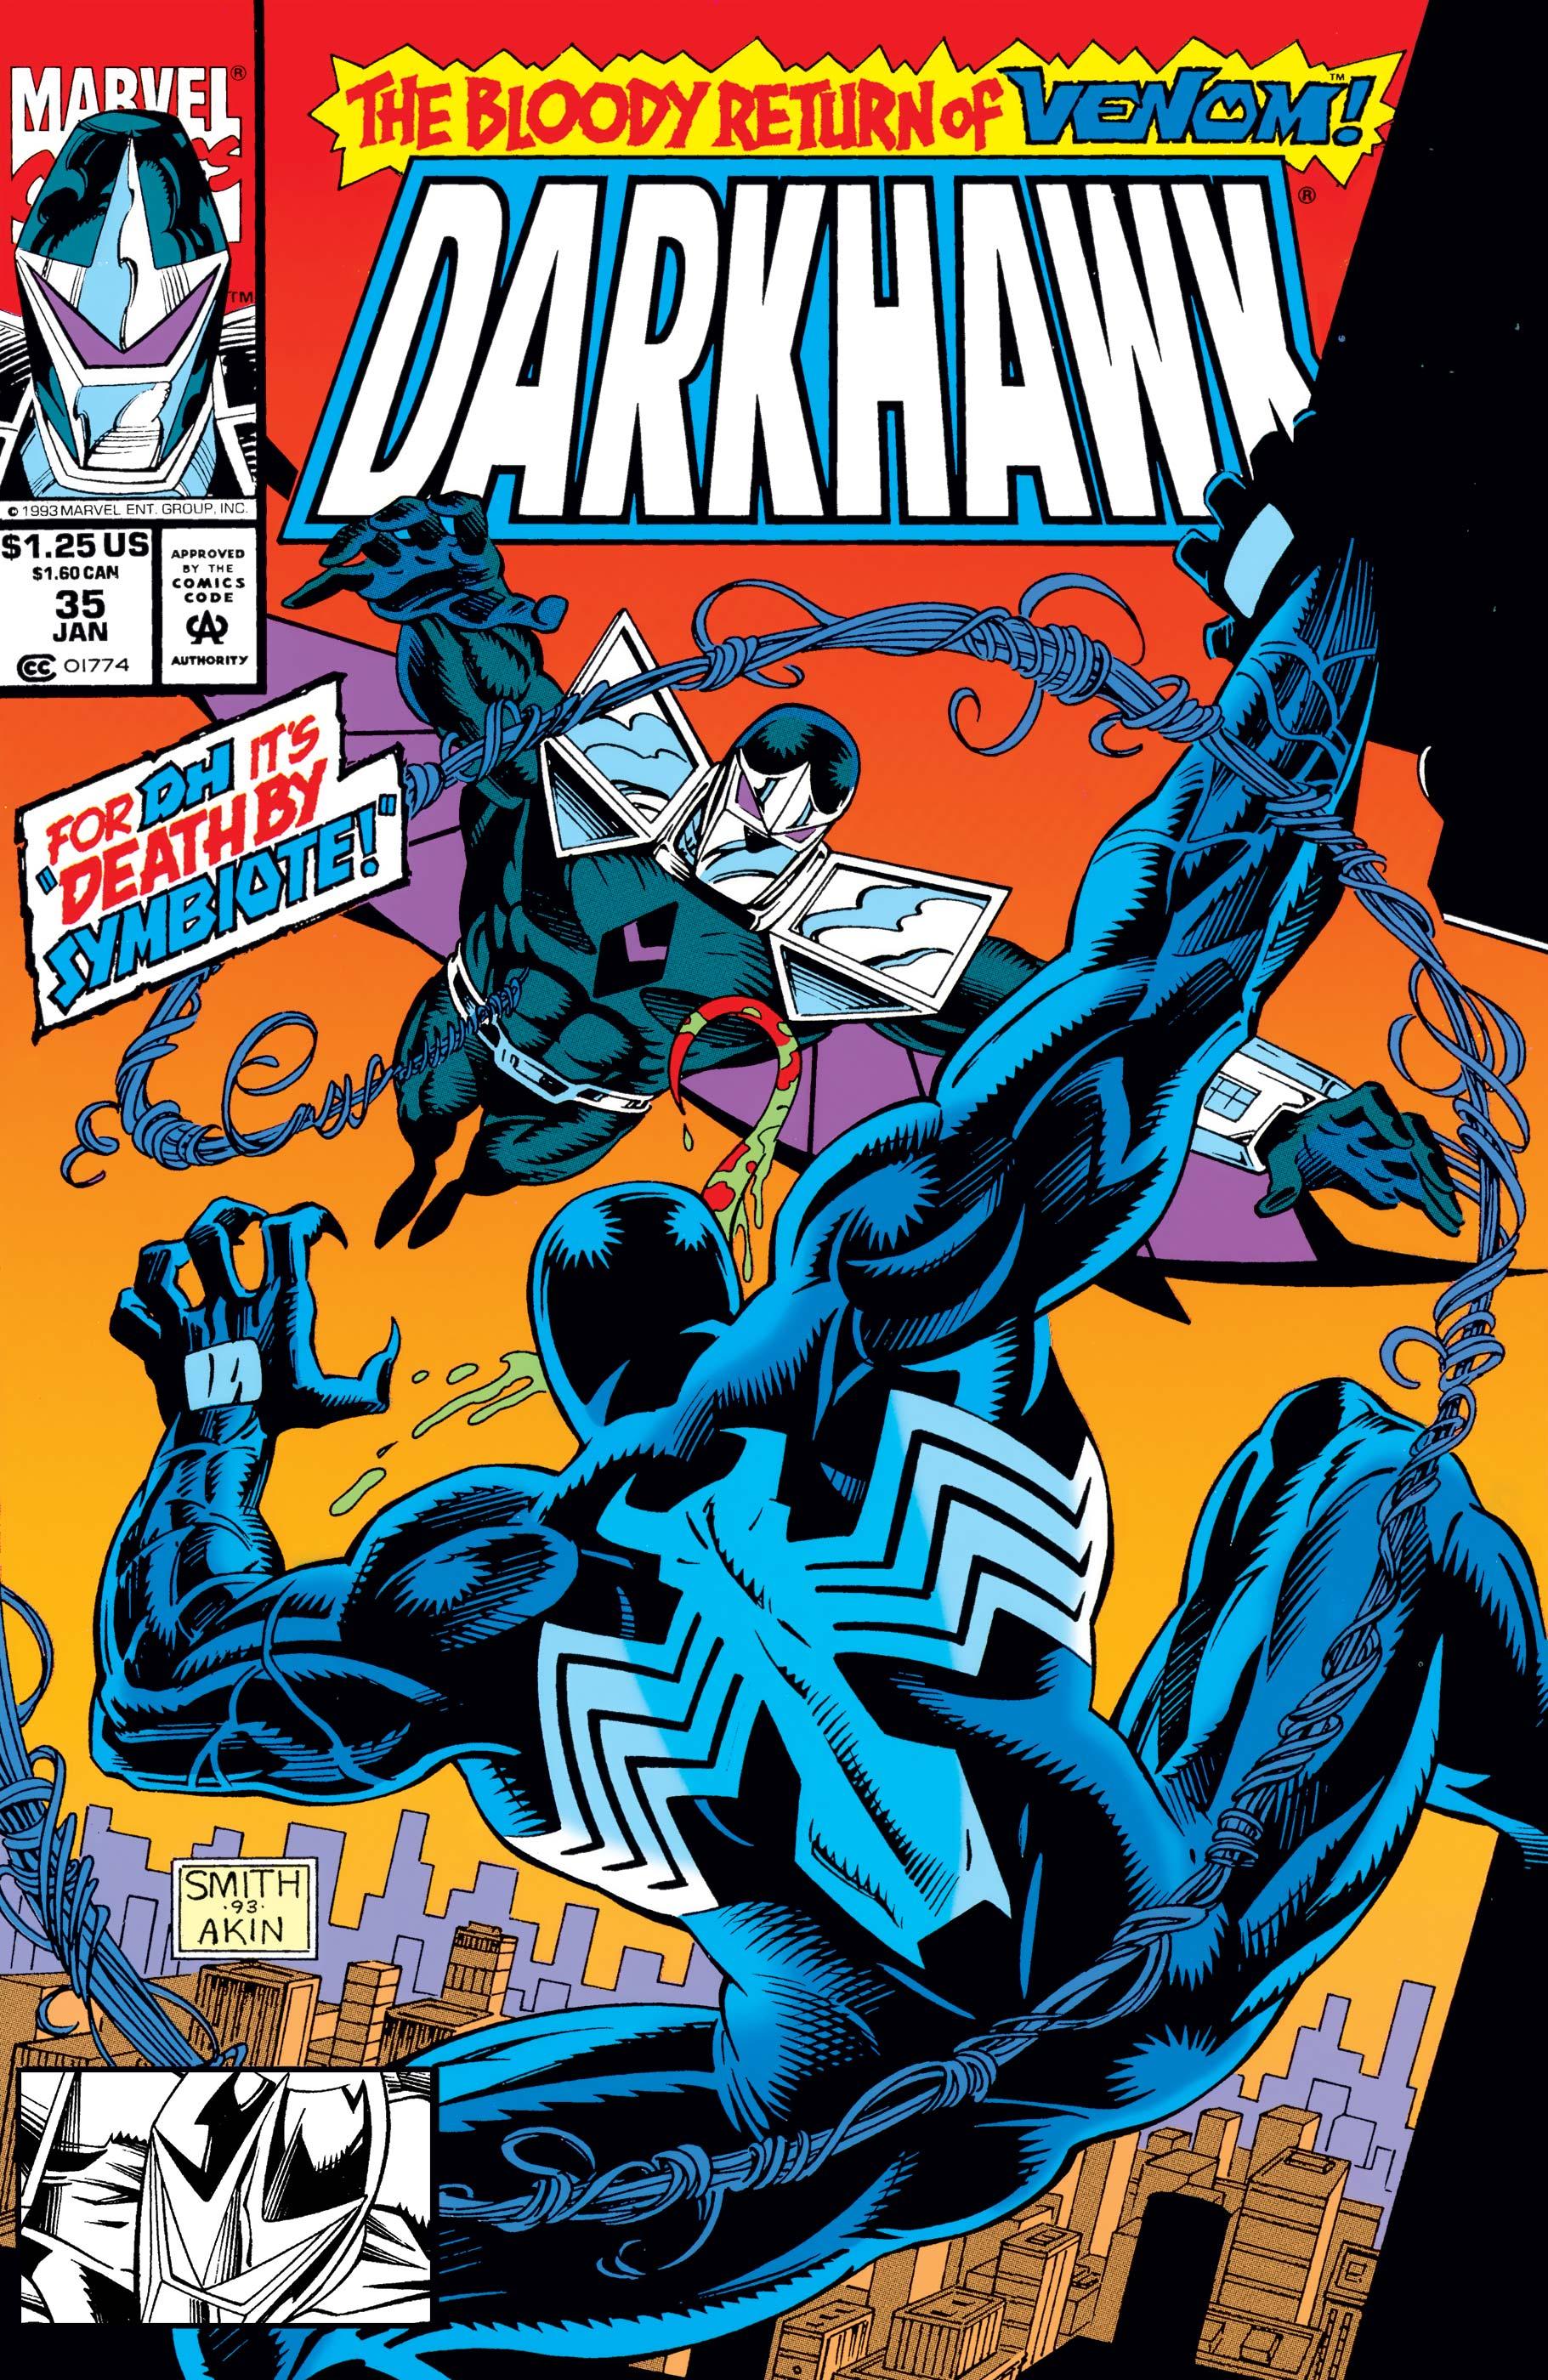 Darkhawk (1991) #35